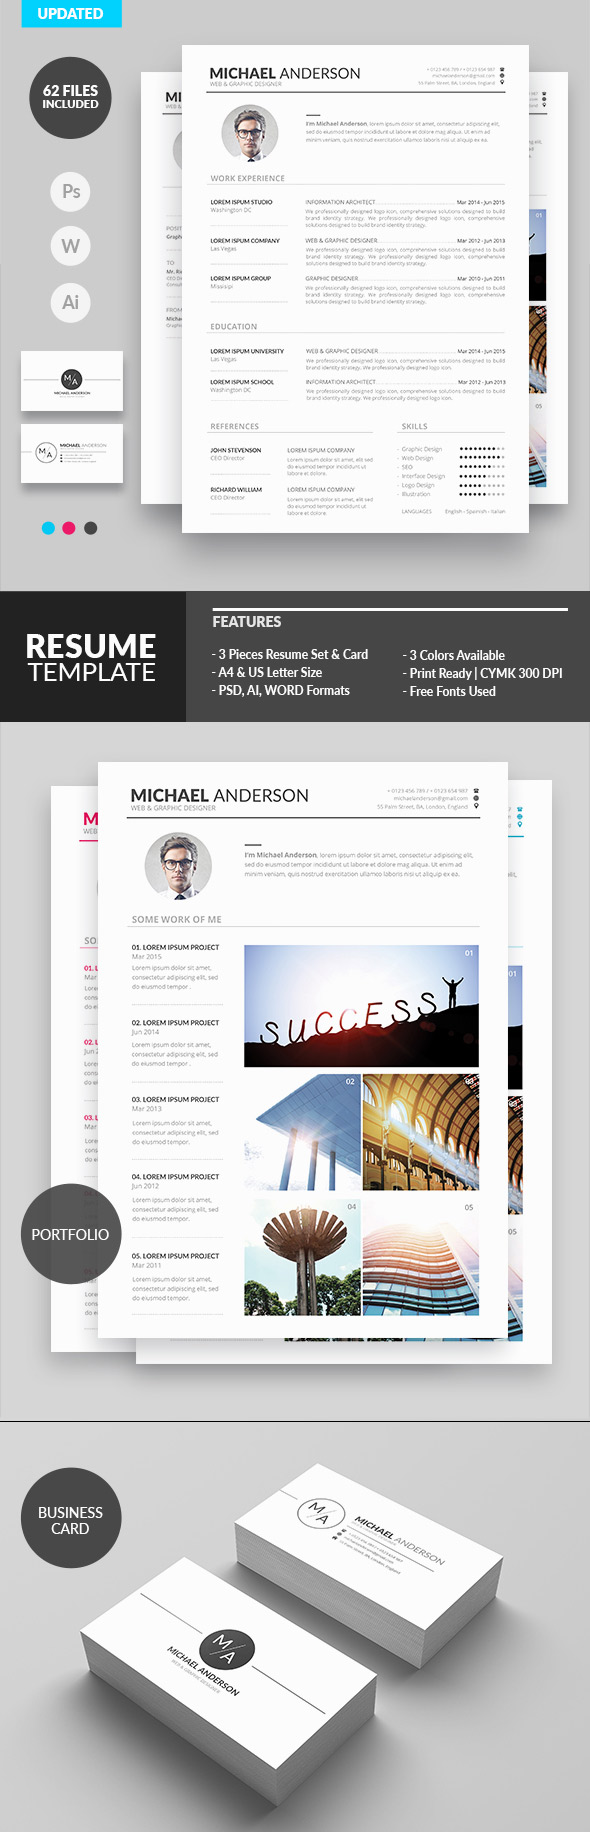 50 Best Minimal Resume Templates - 25